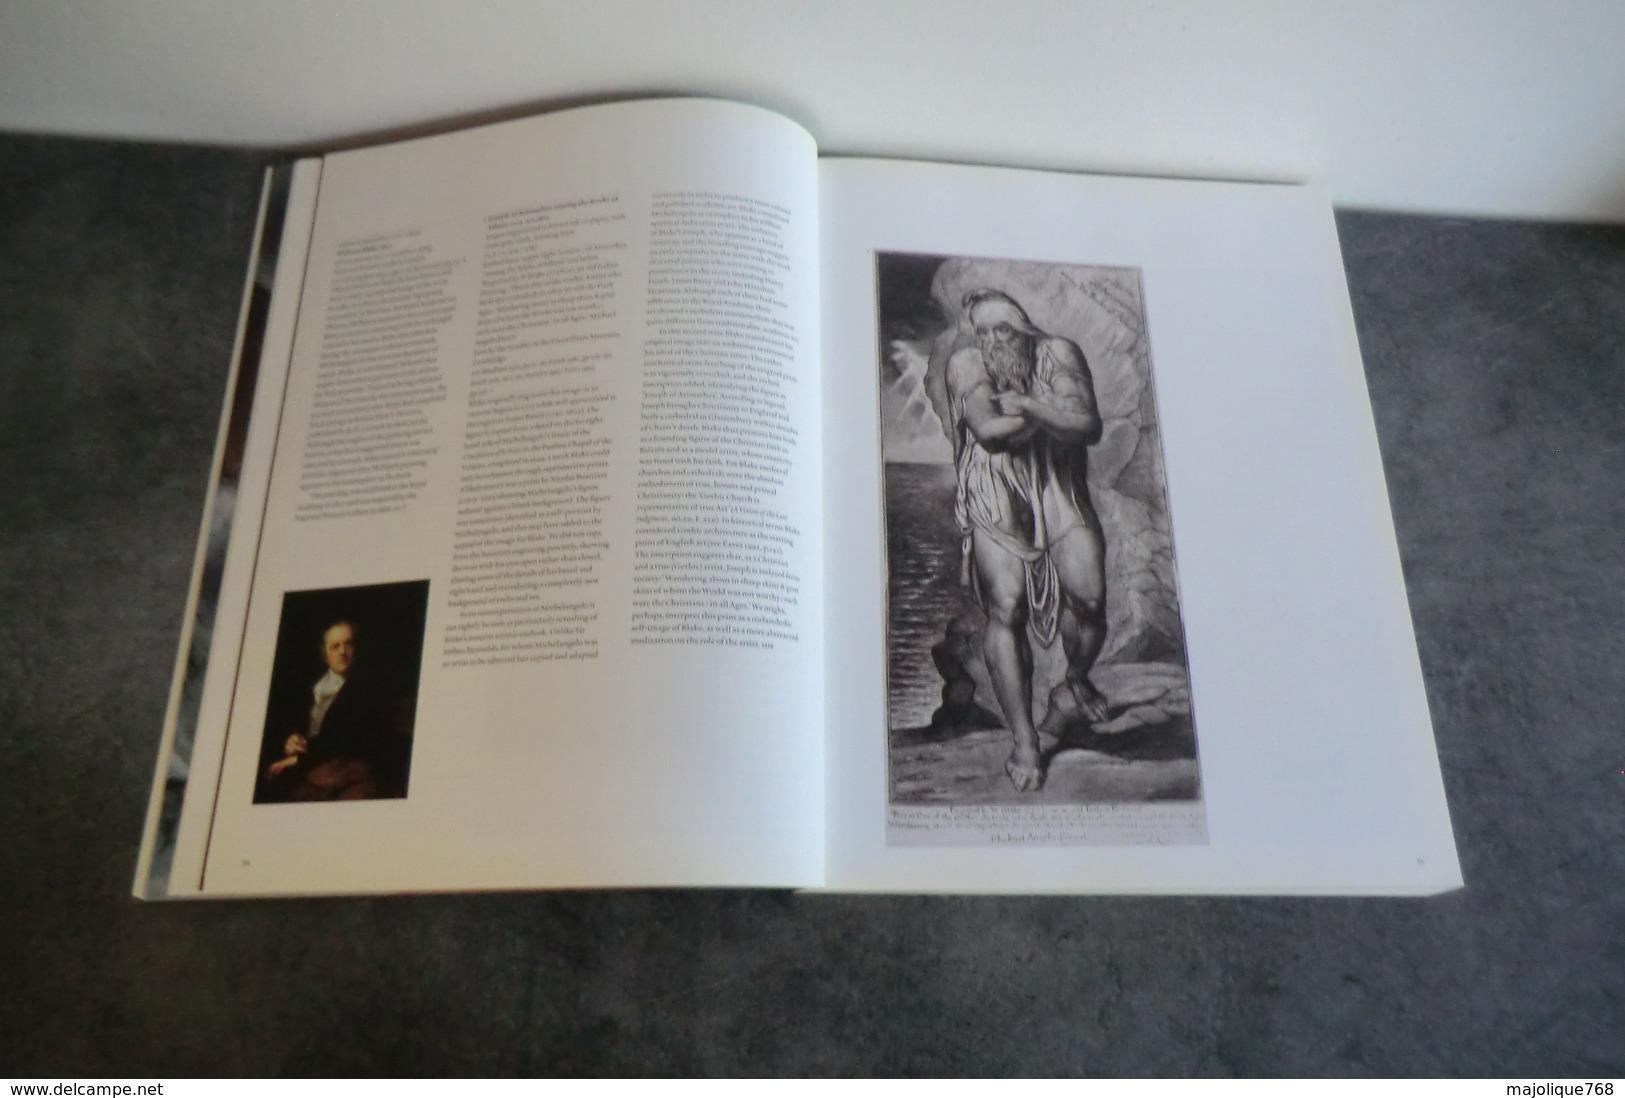 William Blake - Par Robin Hamlyn Et Michael Phillips - -Peter Ackroyd Et Marilyn Butler - 2000 - - Beaux-Arts